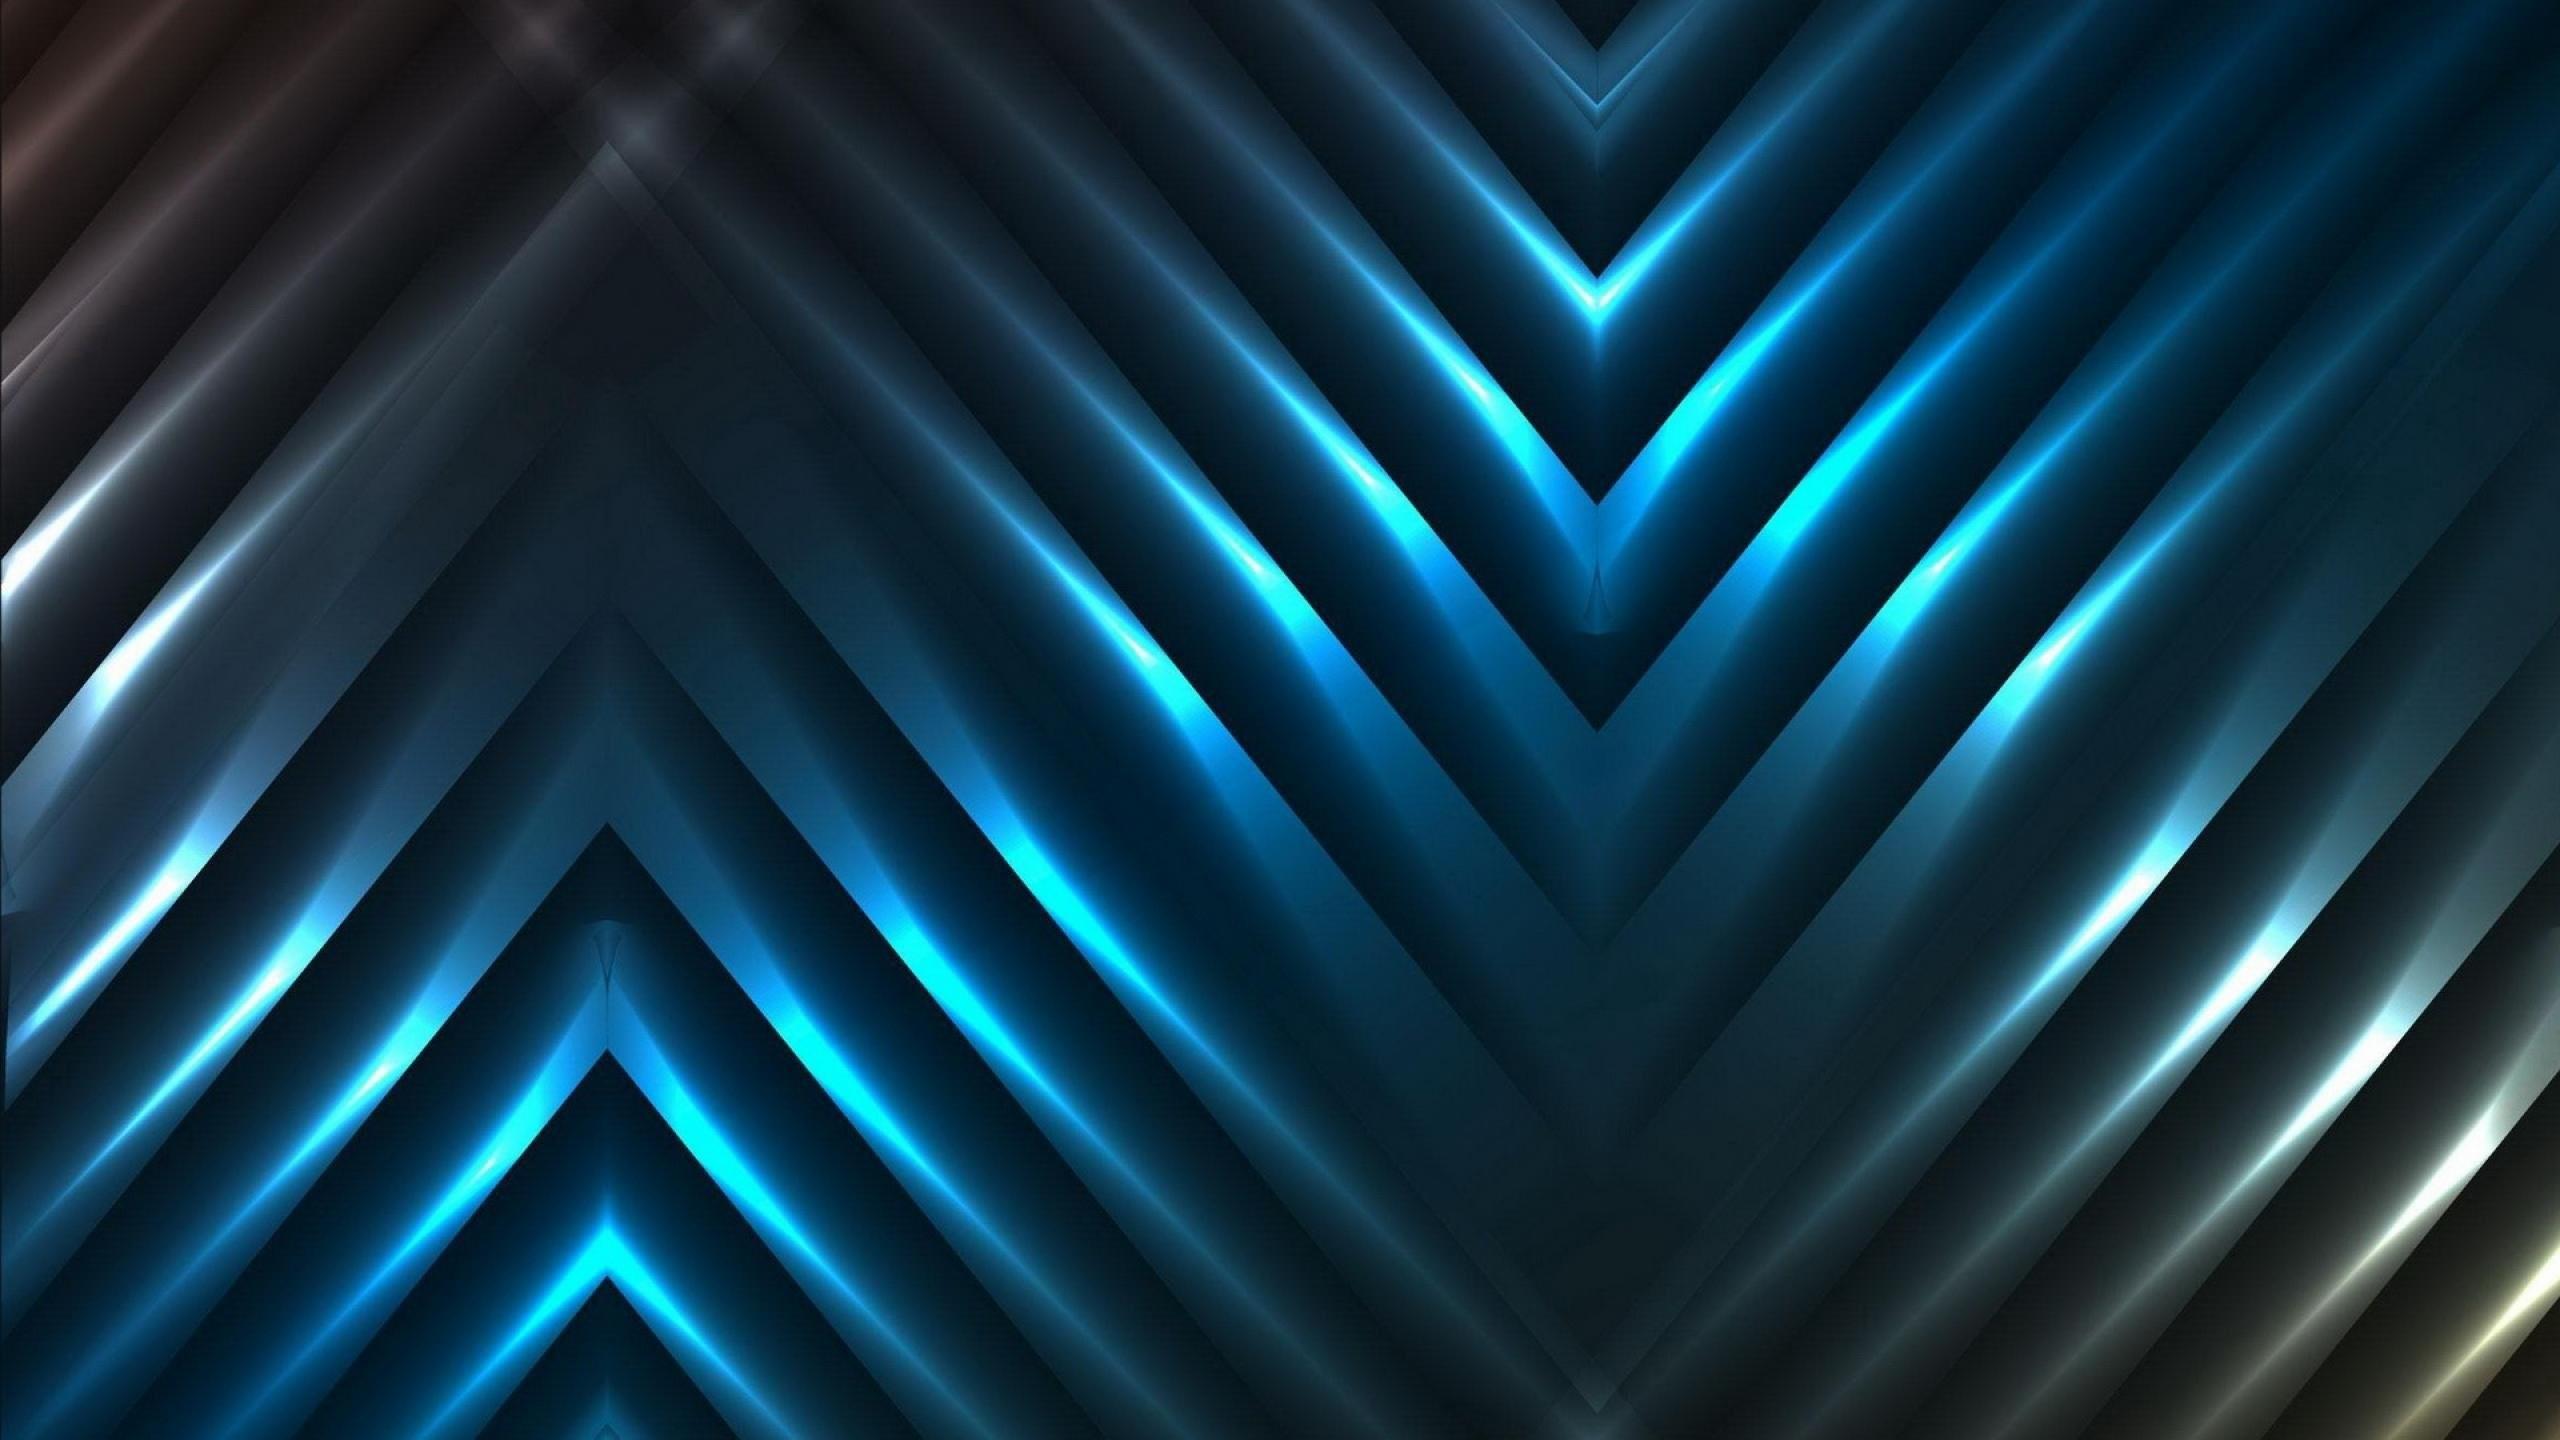 Black background patterns wallpaper widescreen desktop mobile iphone  android hd wallpaper and desktop.